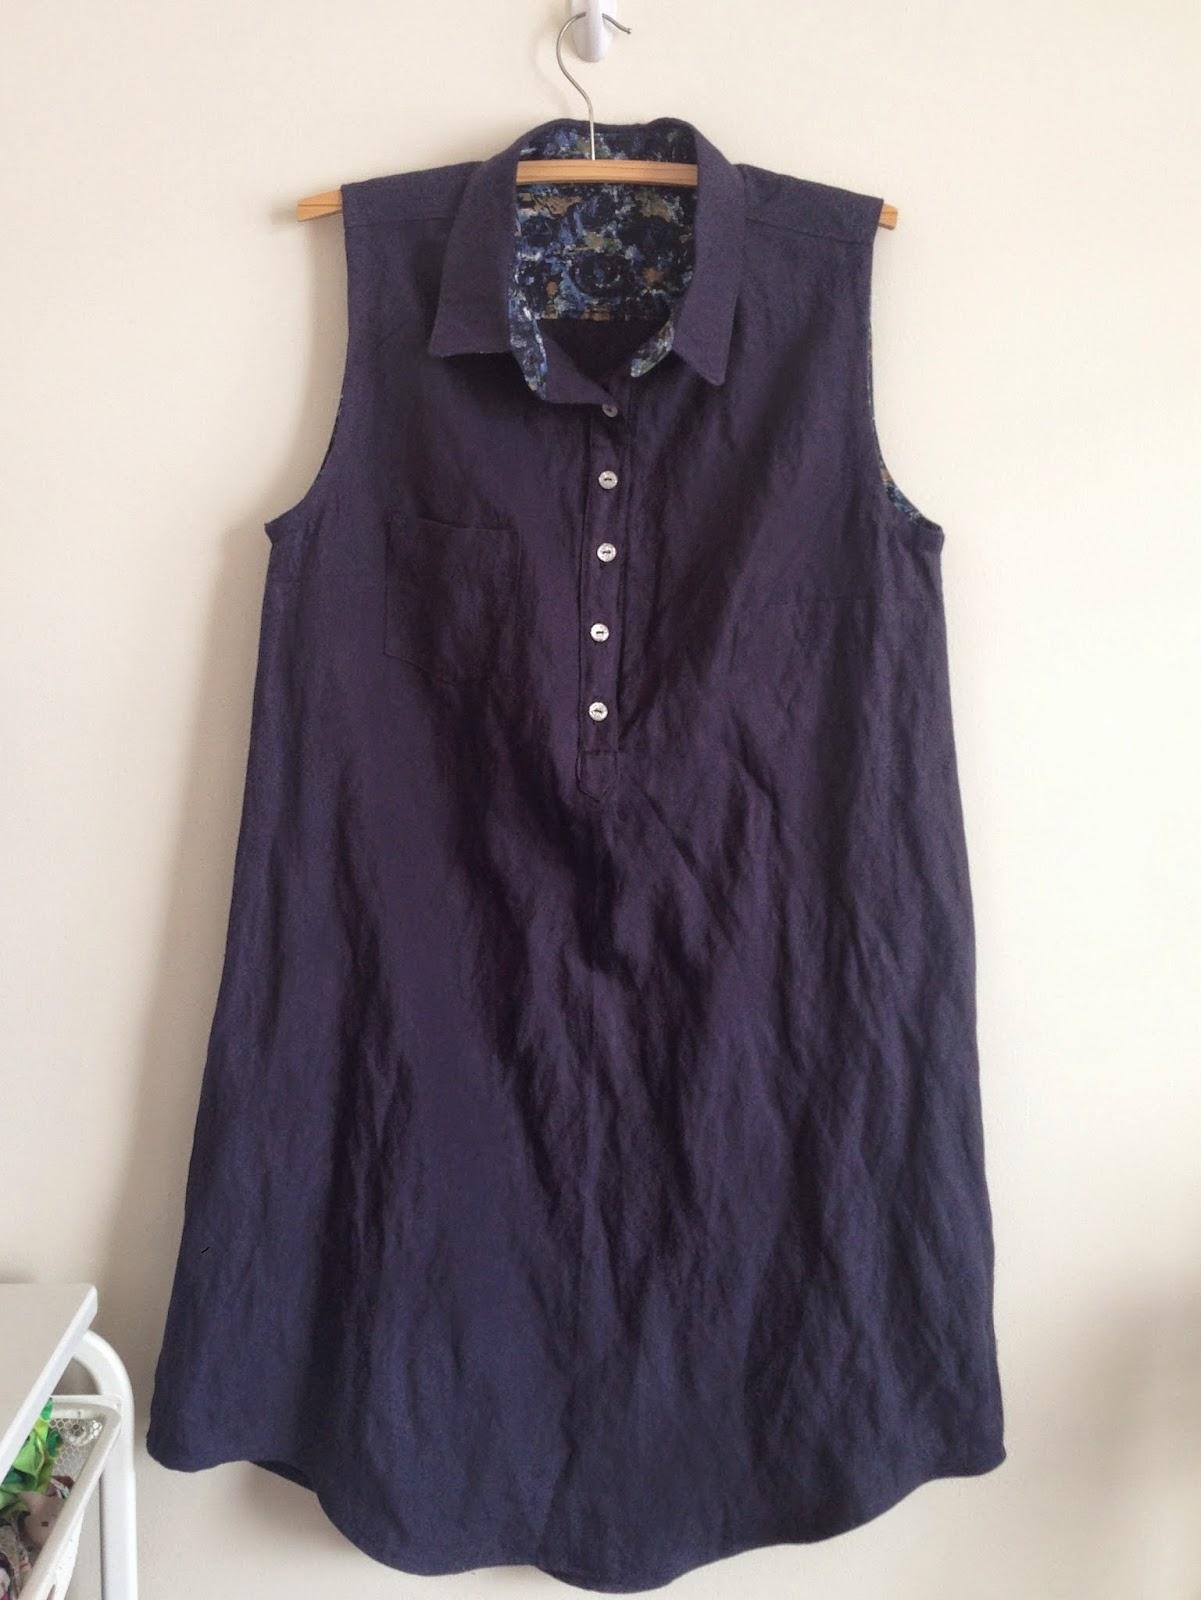 Alder Popover shirtdress